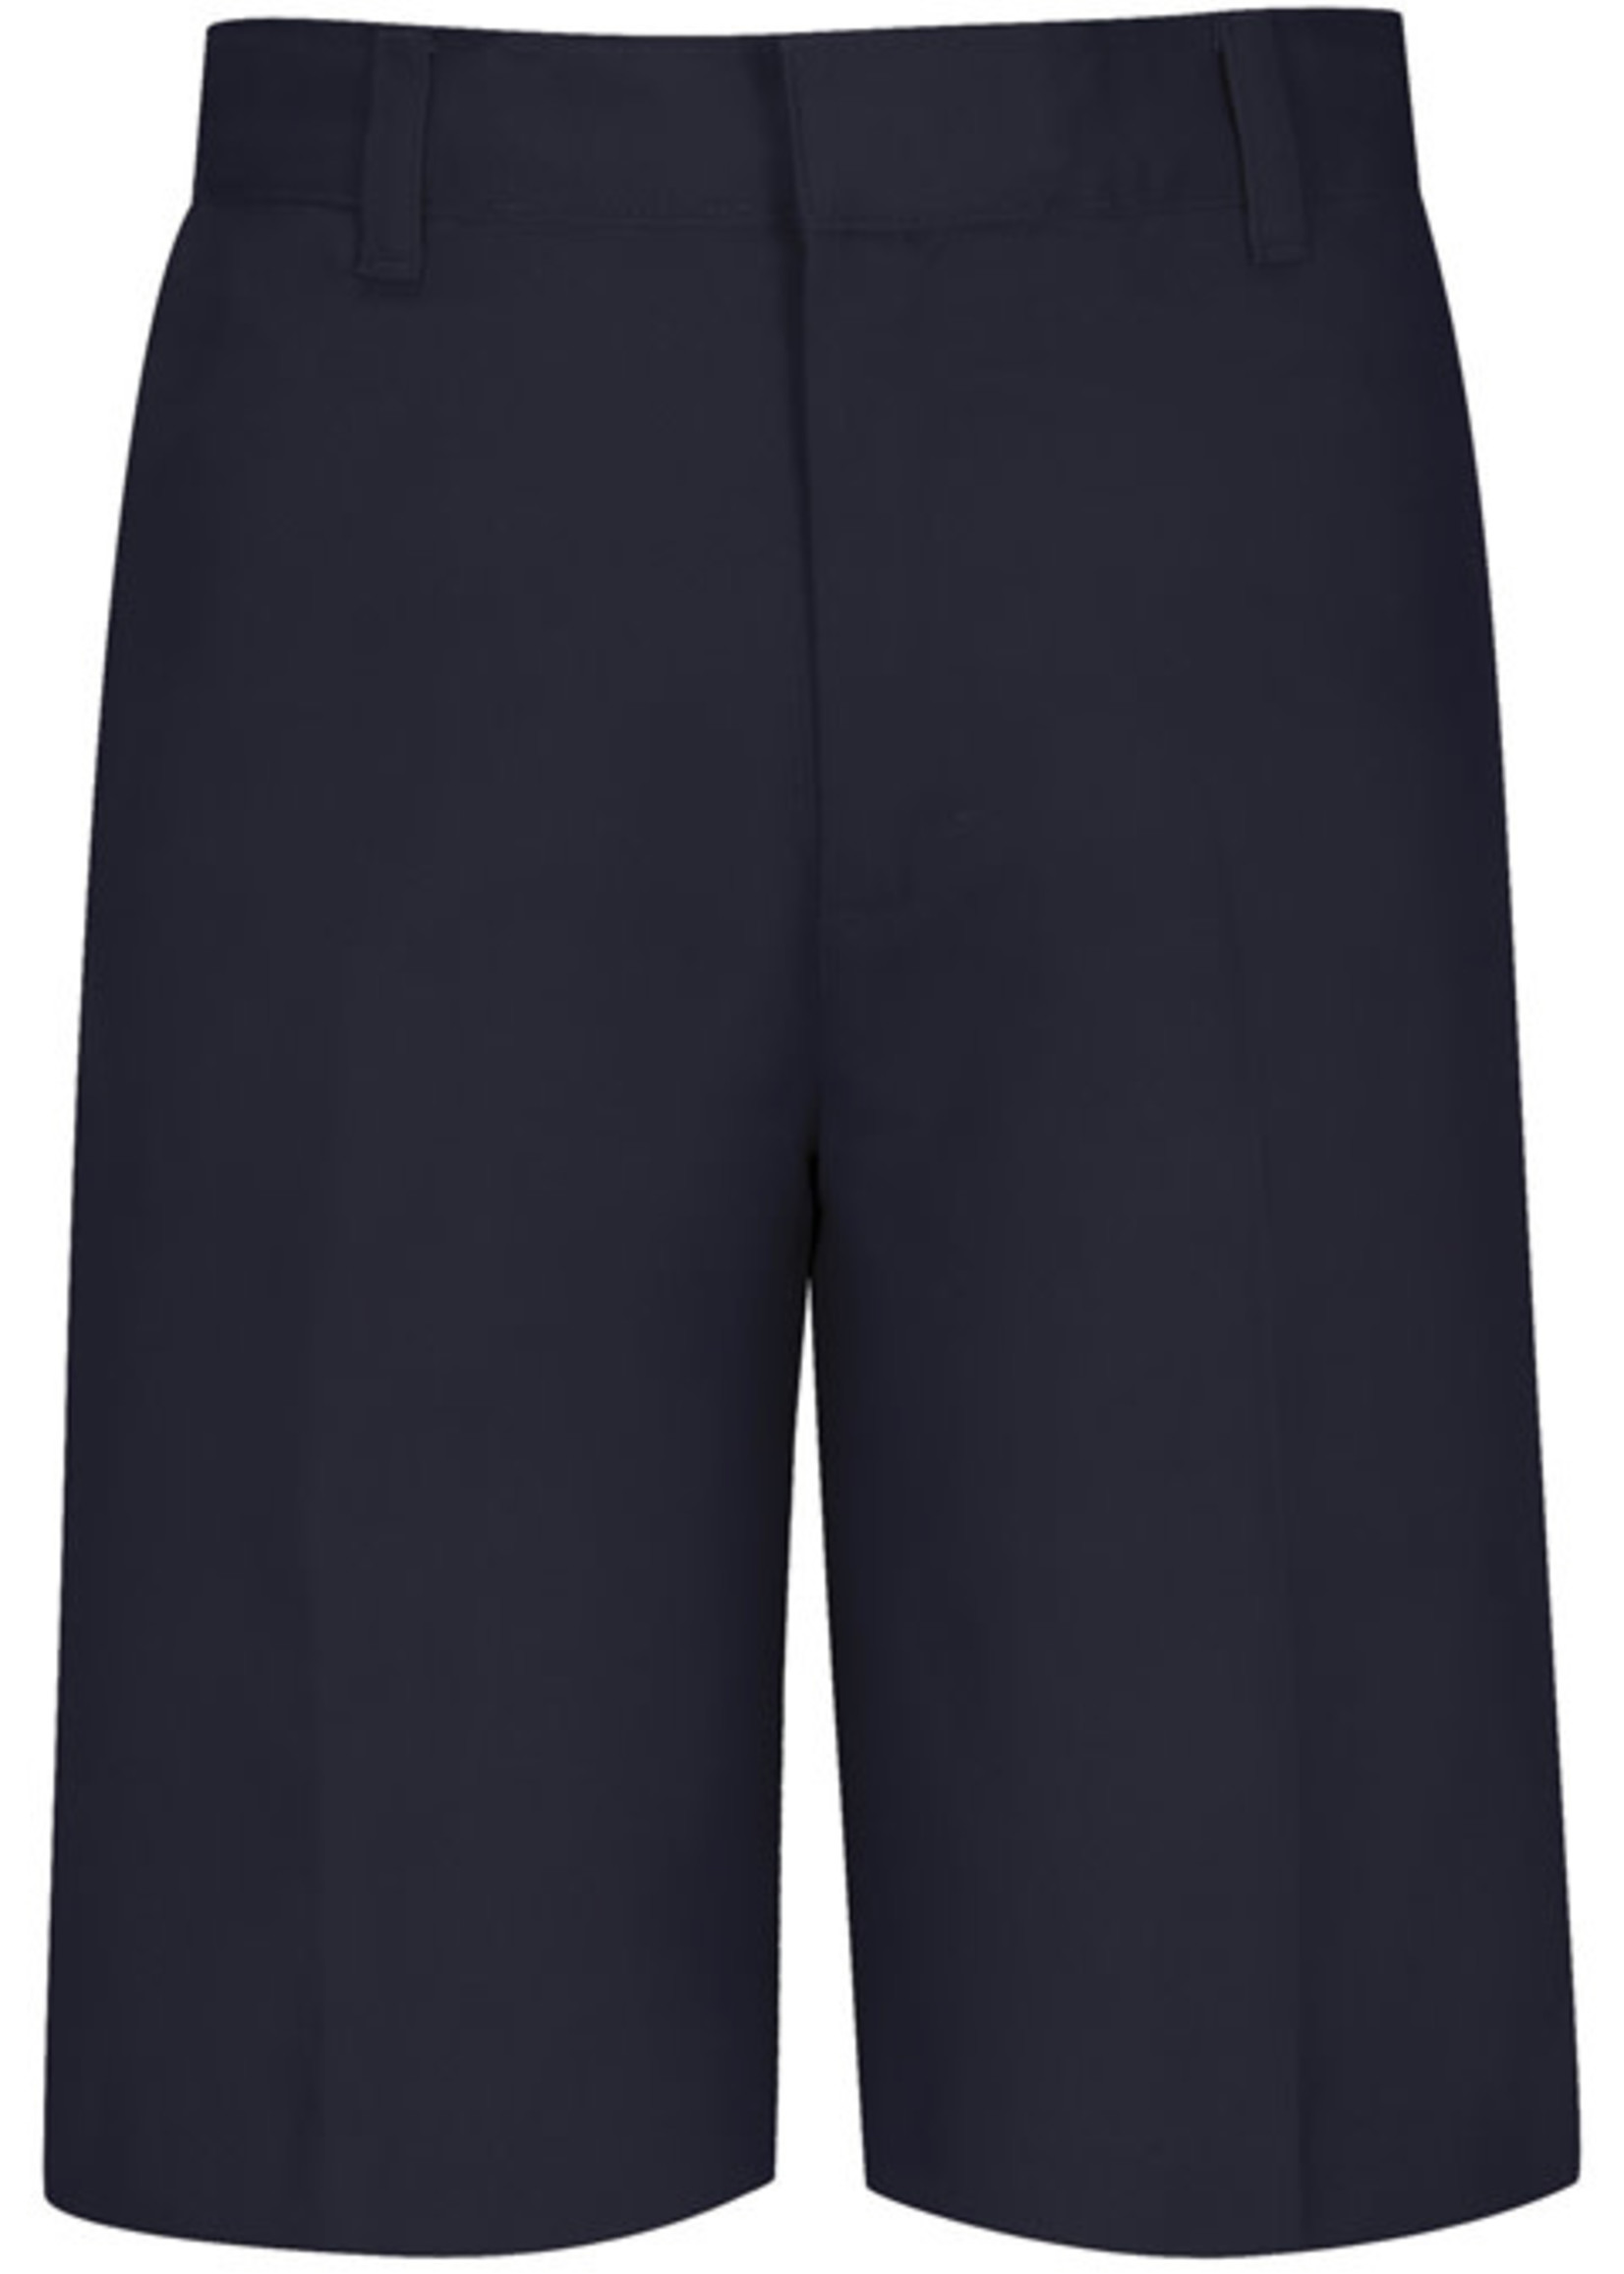 CLS Navy Value Flat Front Boys Shorts